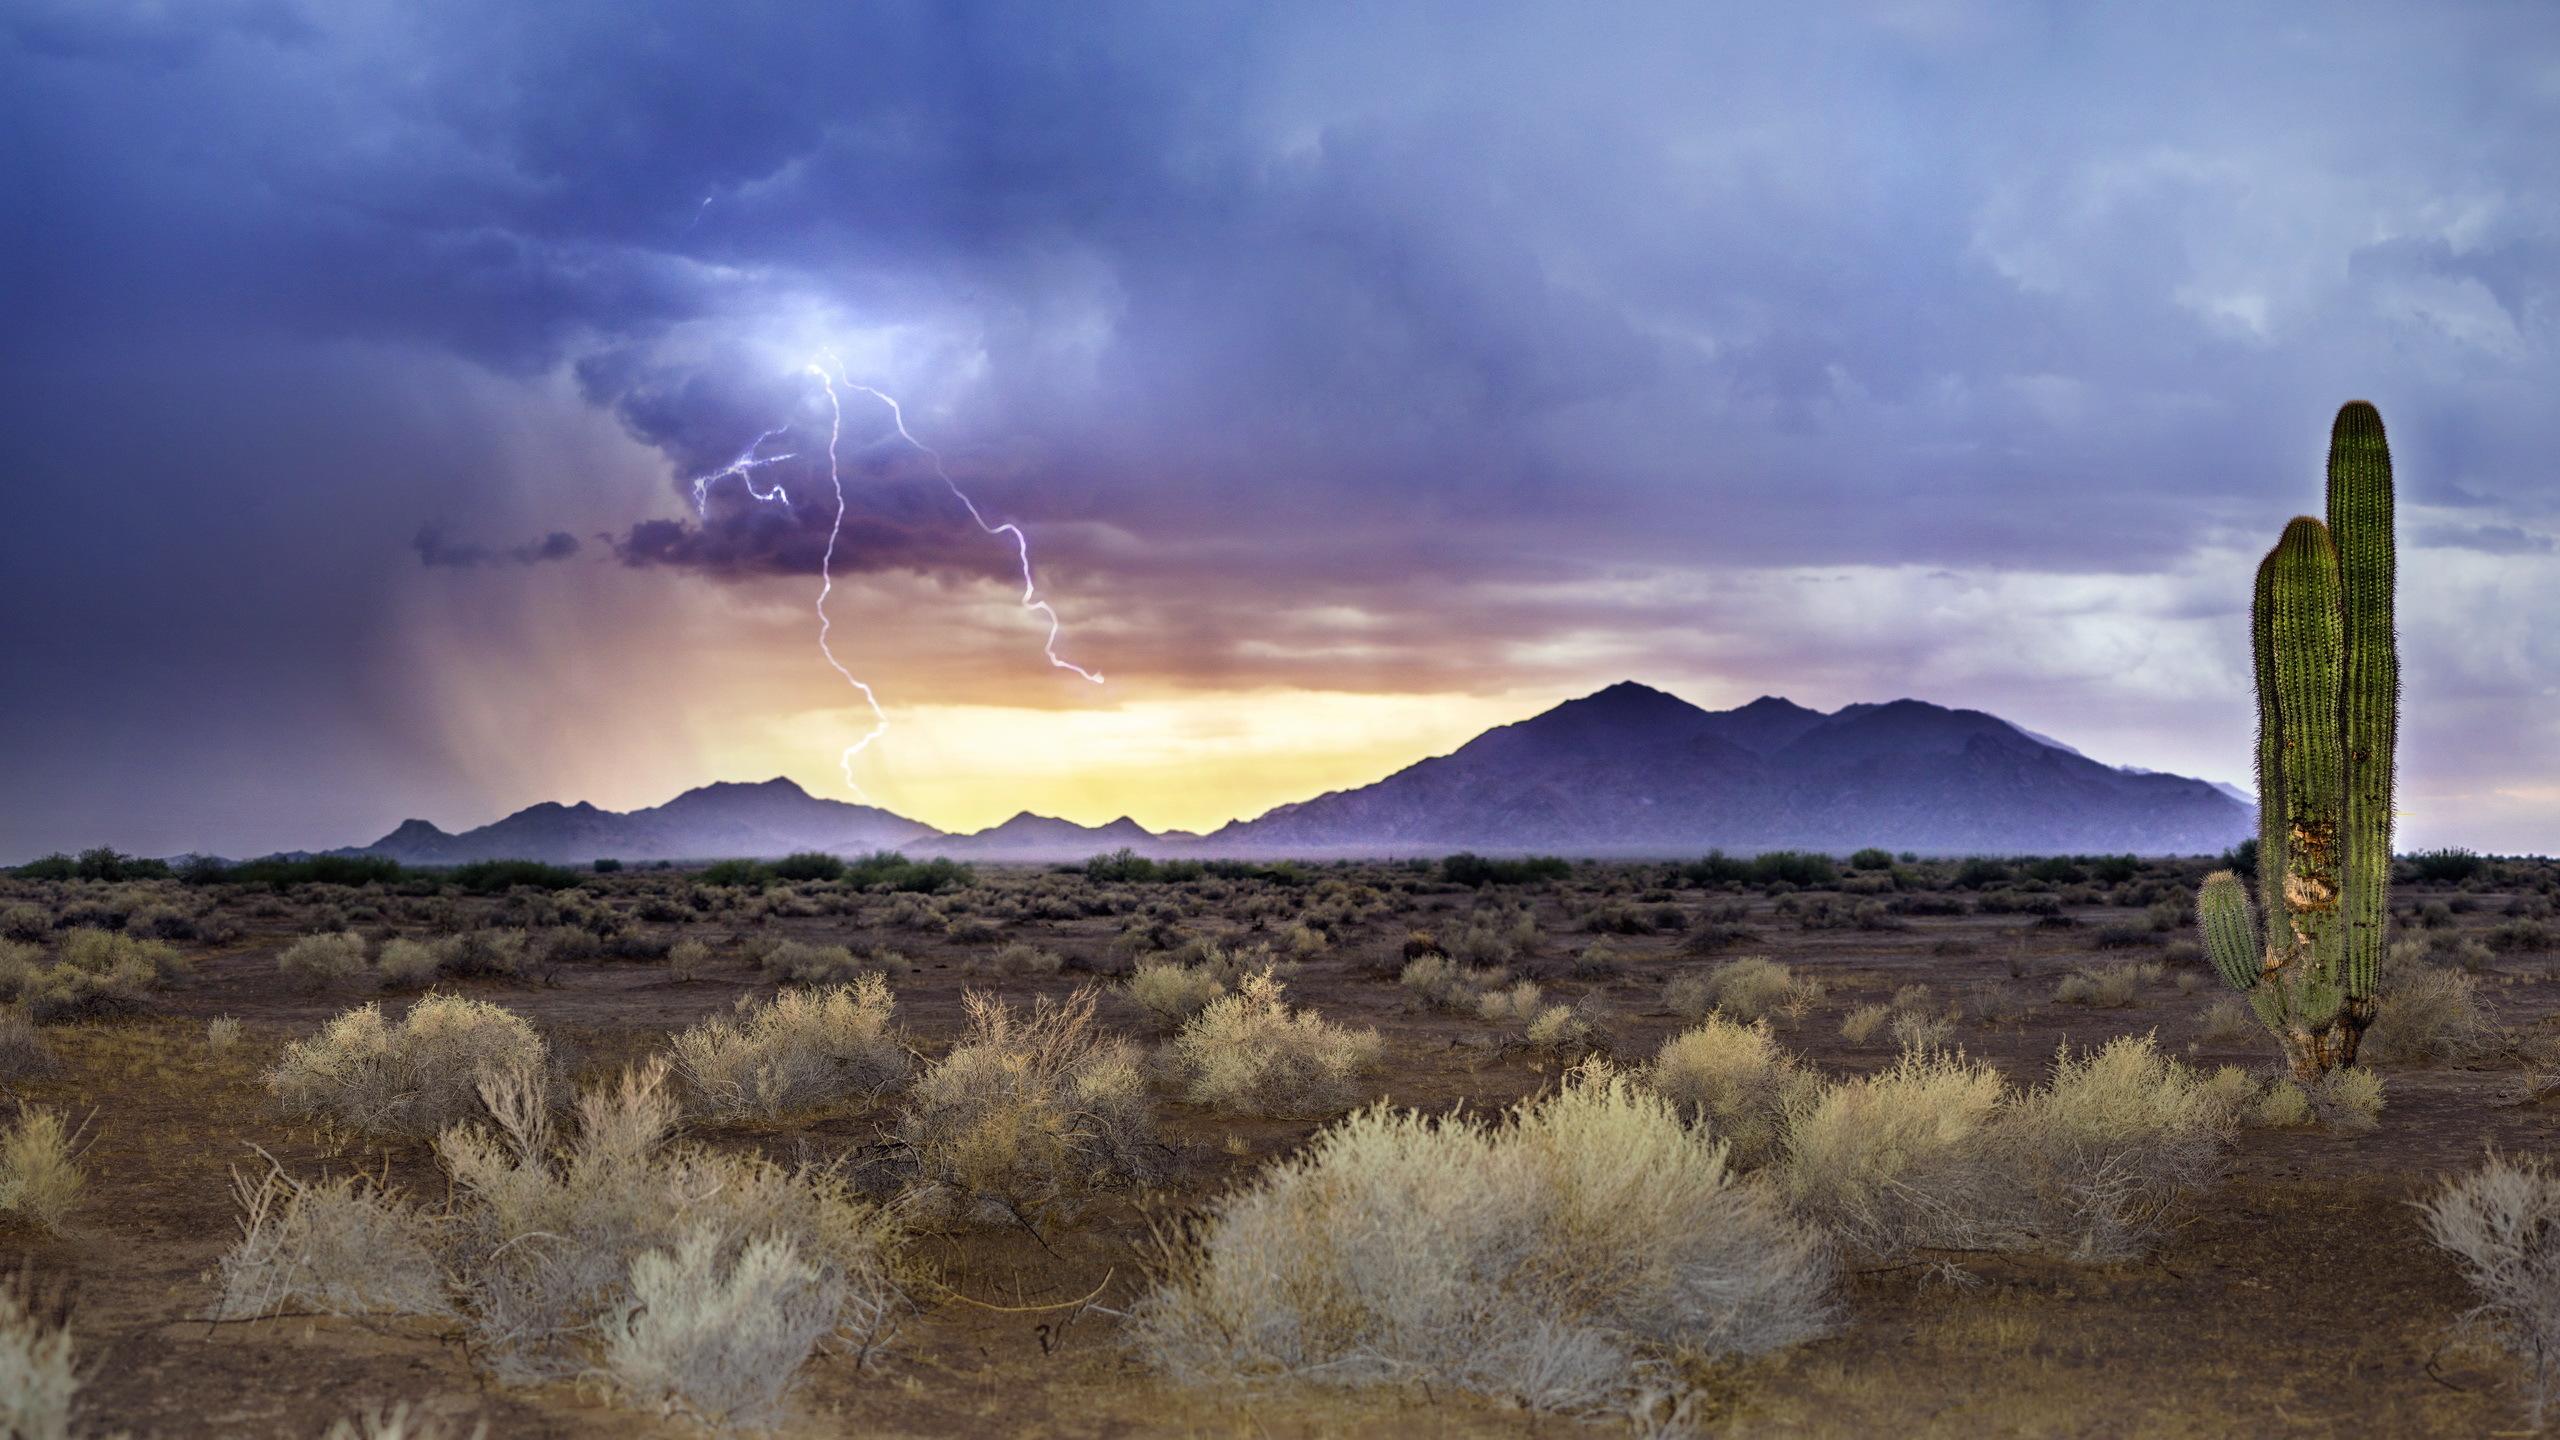 Arizona sunset wallpaper wallpapersafari for Monsoon wallpaper